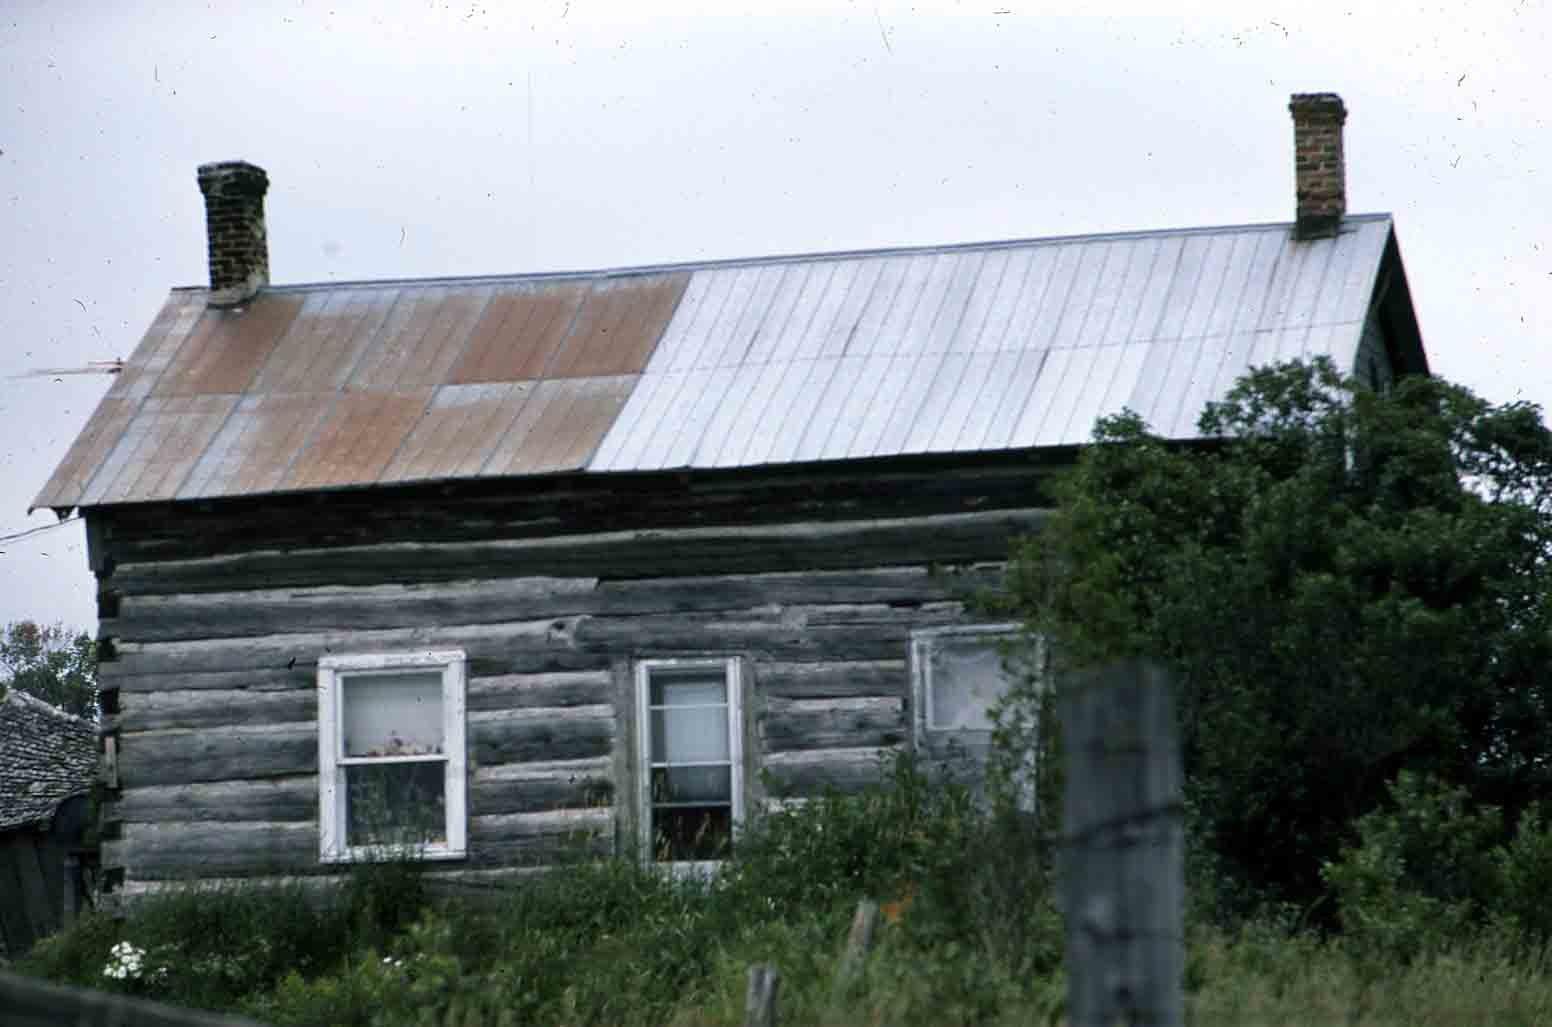 Log cabin, Location unknown